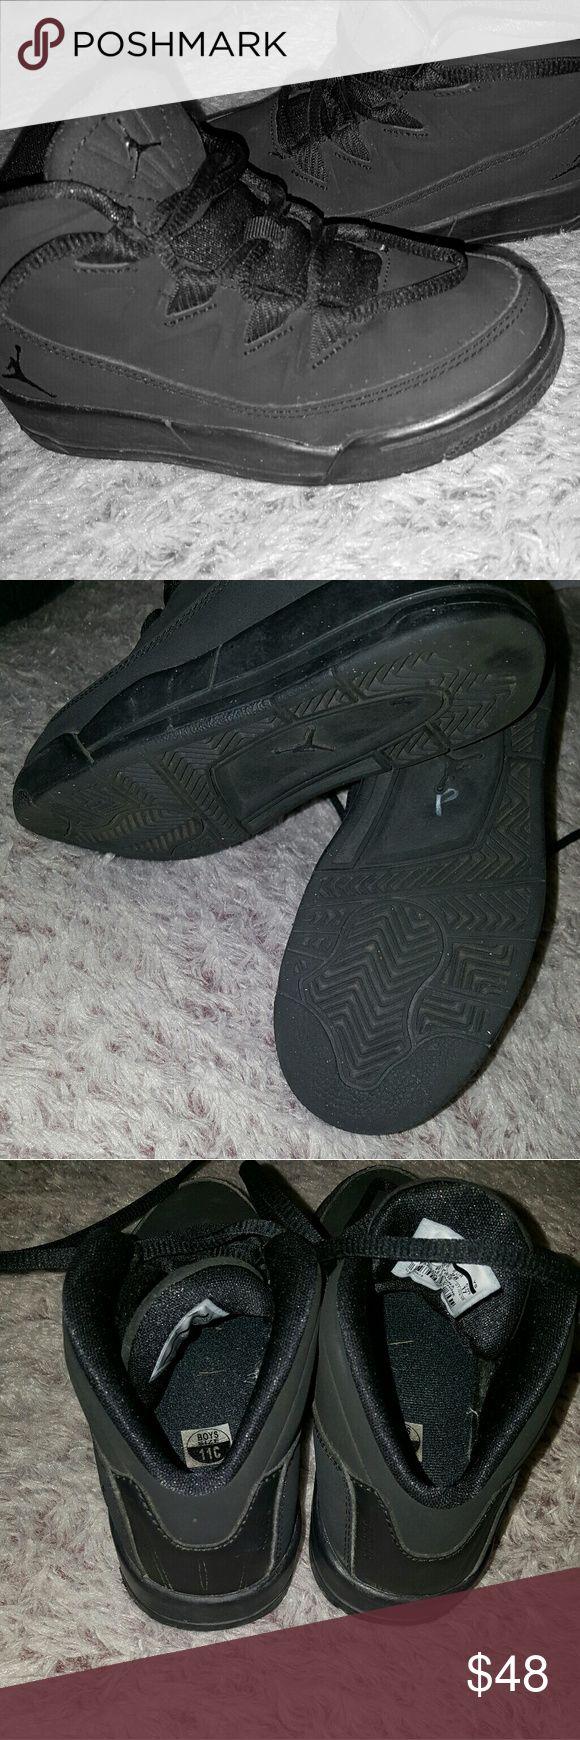 Jordan deluxe little kids Jordan deluxe, all black in great condition. Only wore 2x size:11 toddler. Jordan Shoes Sneakers